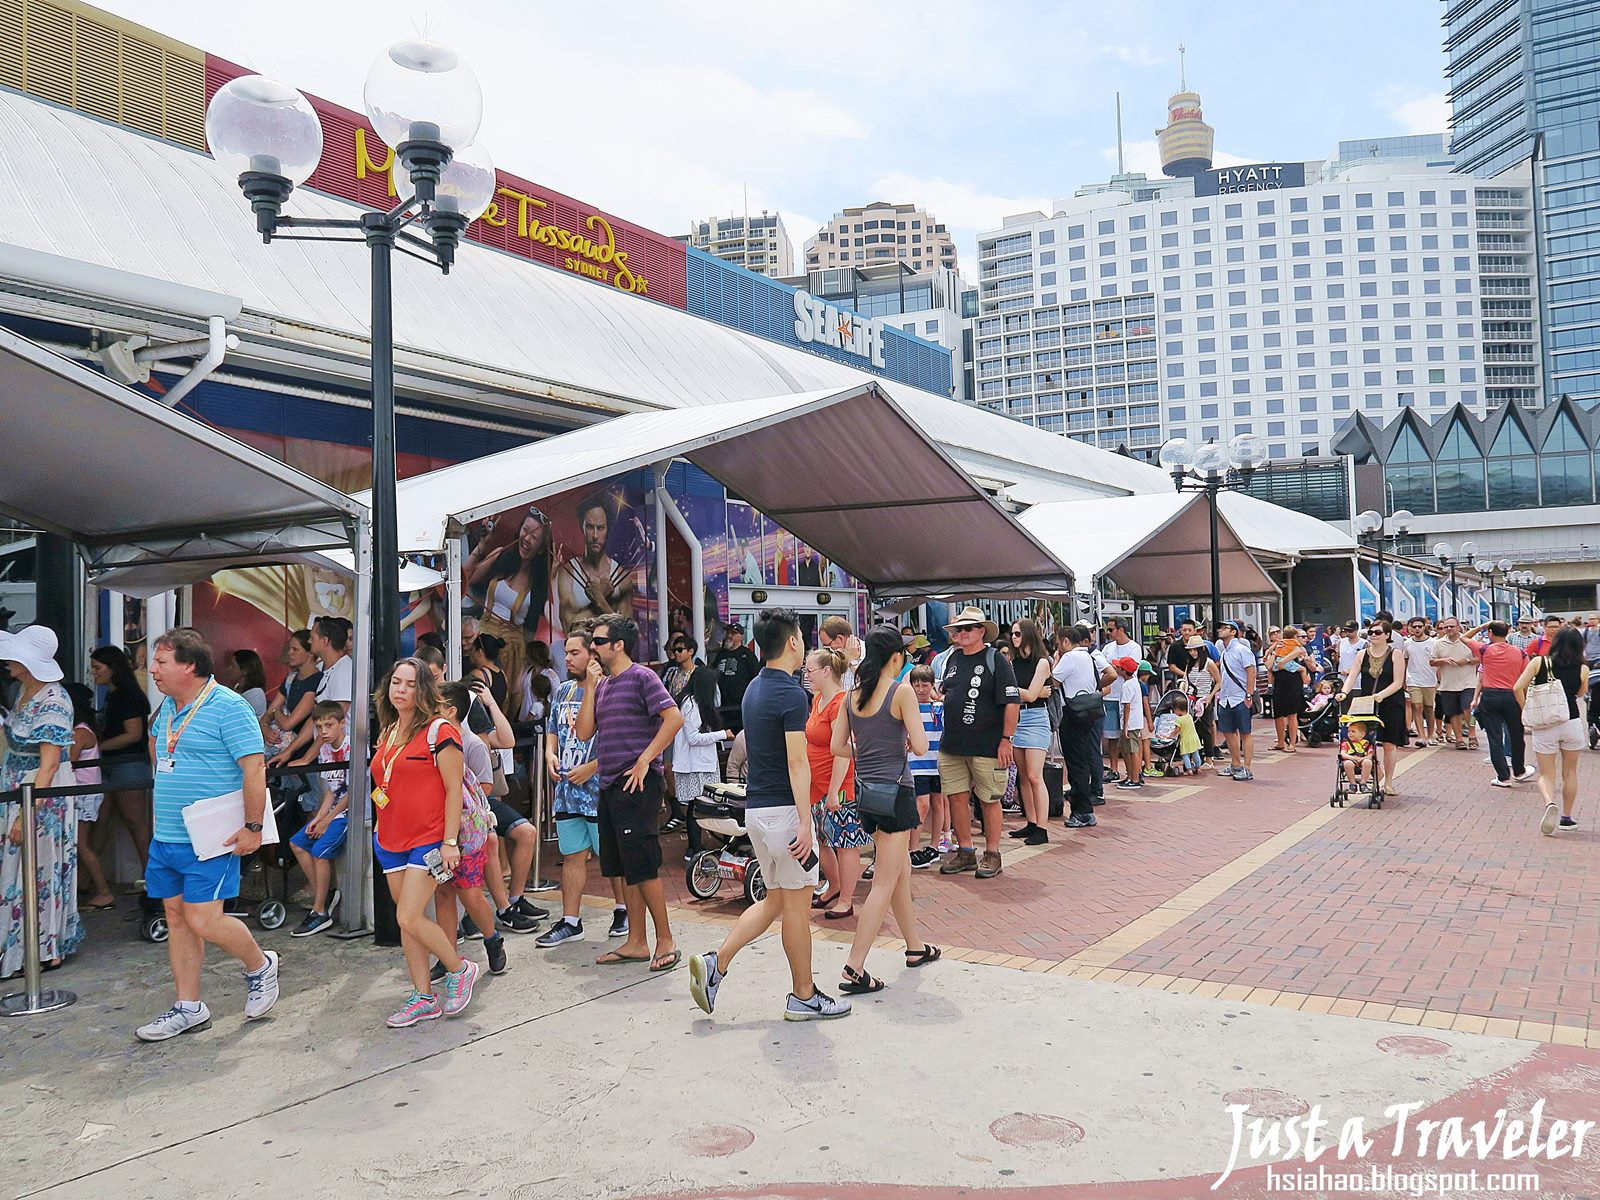 雪梨-景點-推薦-達令港-自由行-行程-旅遊-澳洲-雪梨杜莎夫人蠟像館-Madame Tussauds-Sydney-Darling-Harbour-Tourist-Attraction-Travel